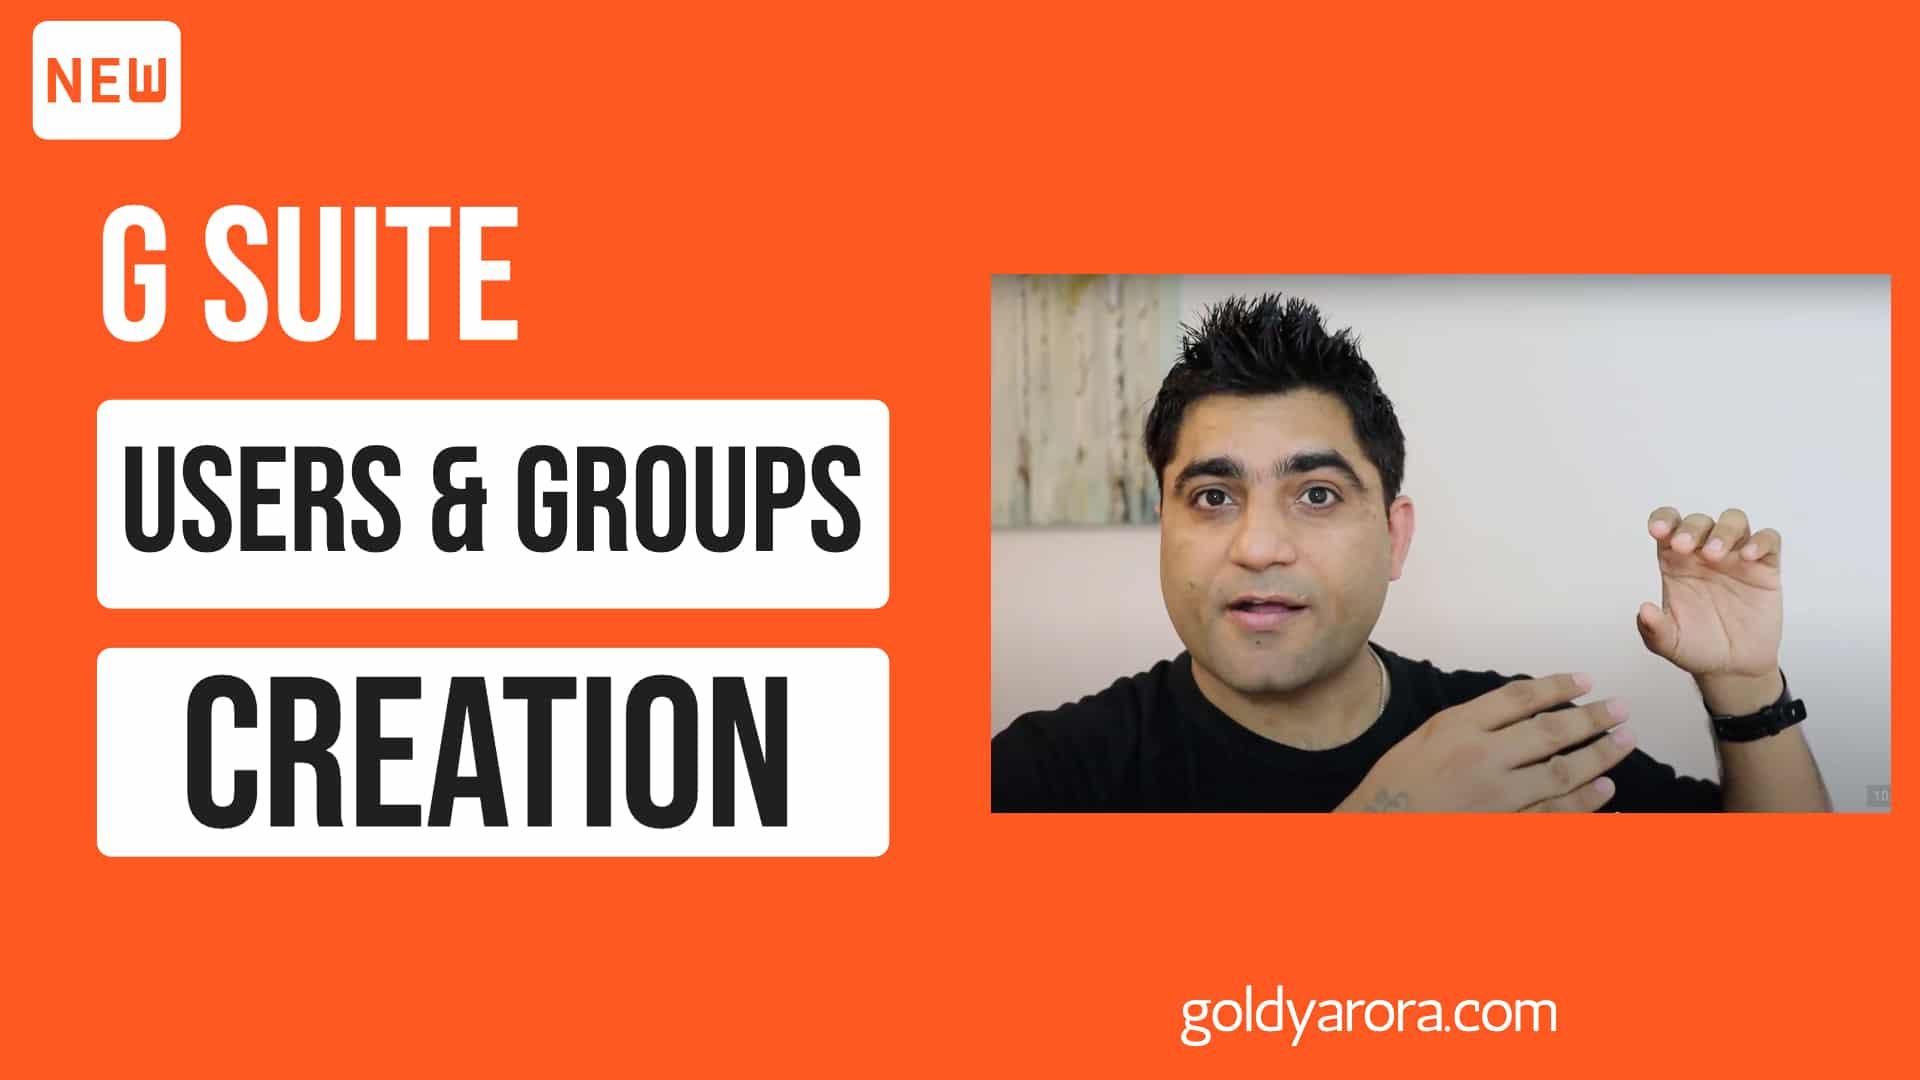 Google Workspace Godaddy Setup - Users & Groups creation